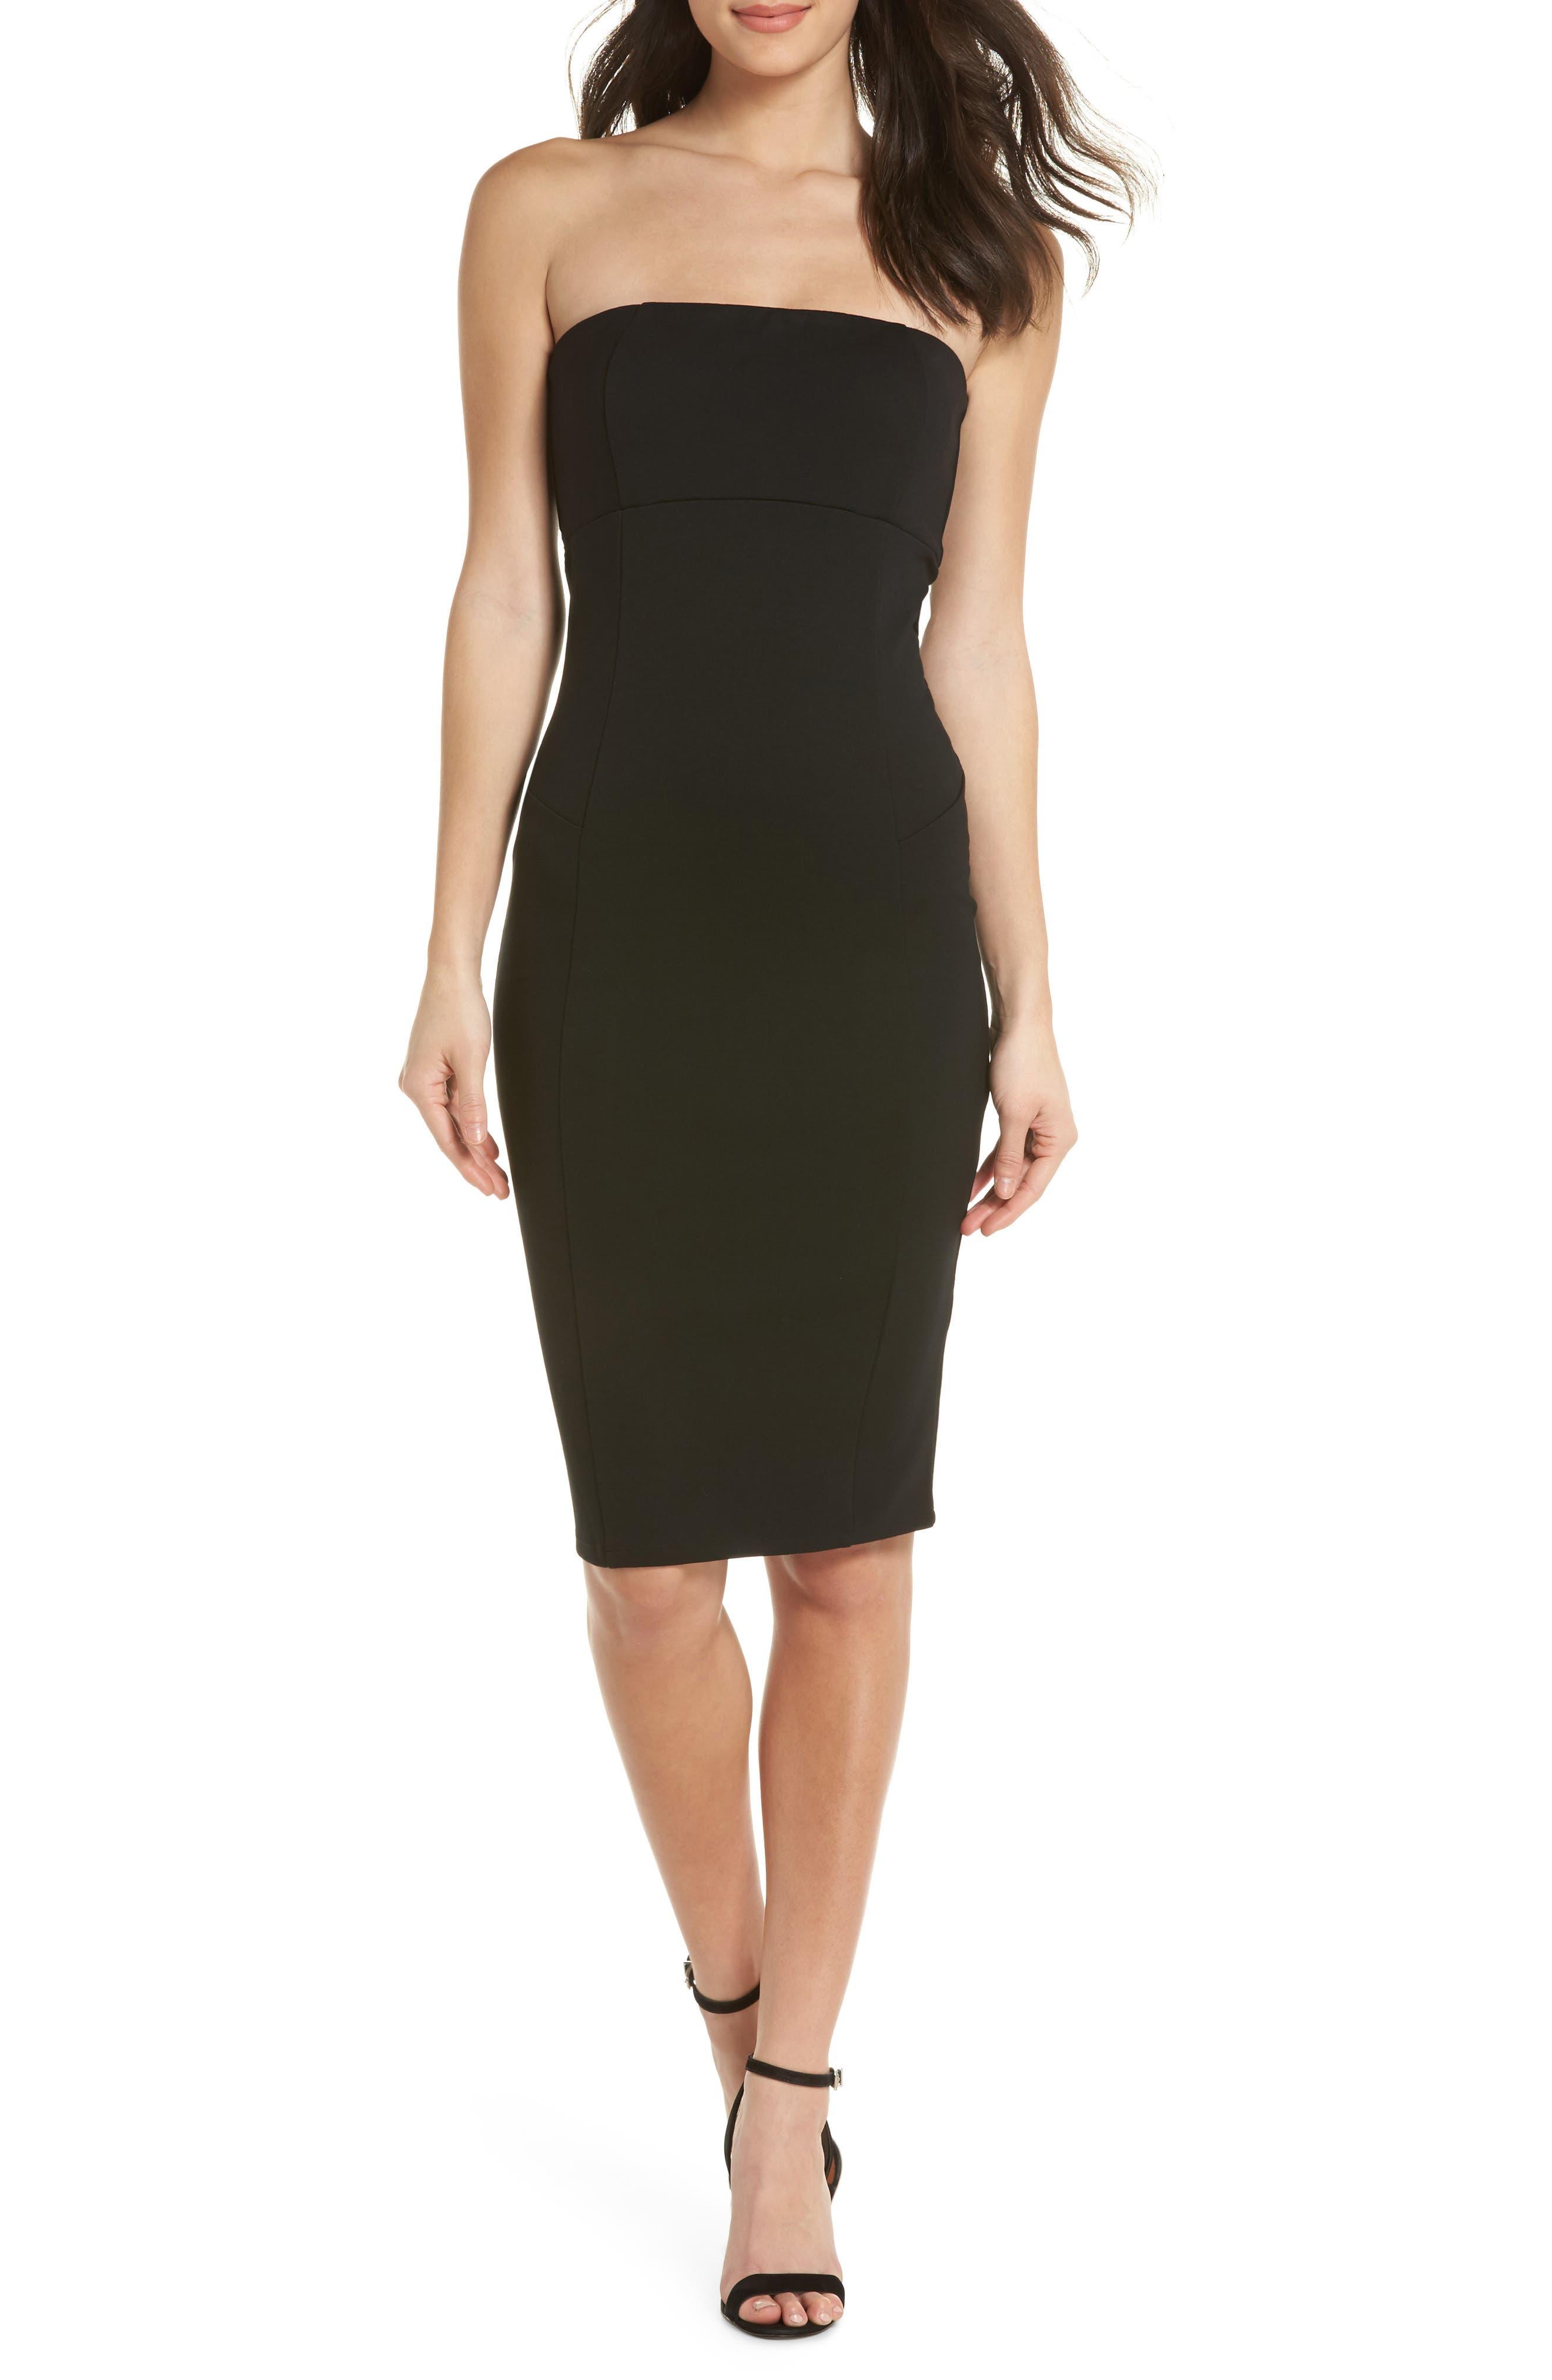 Brianna Strapless Knit Body-Con Dress,                             Main thumbnail 1, color,                             Black